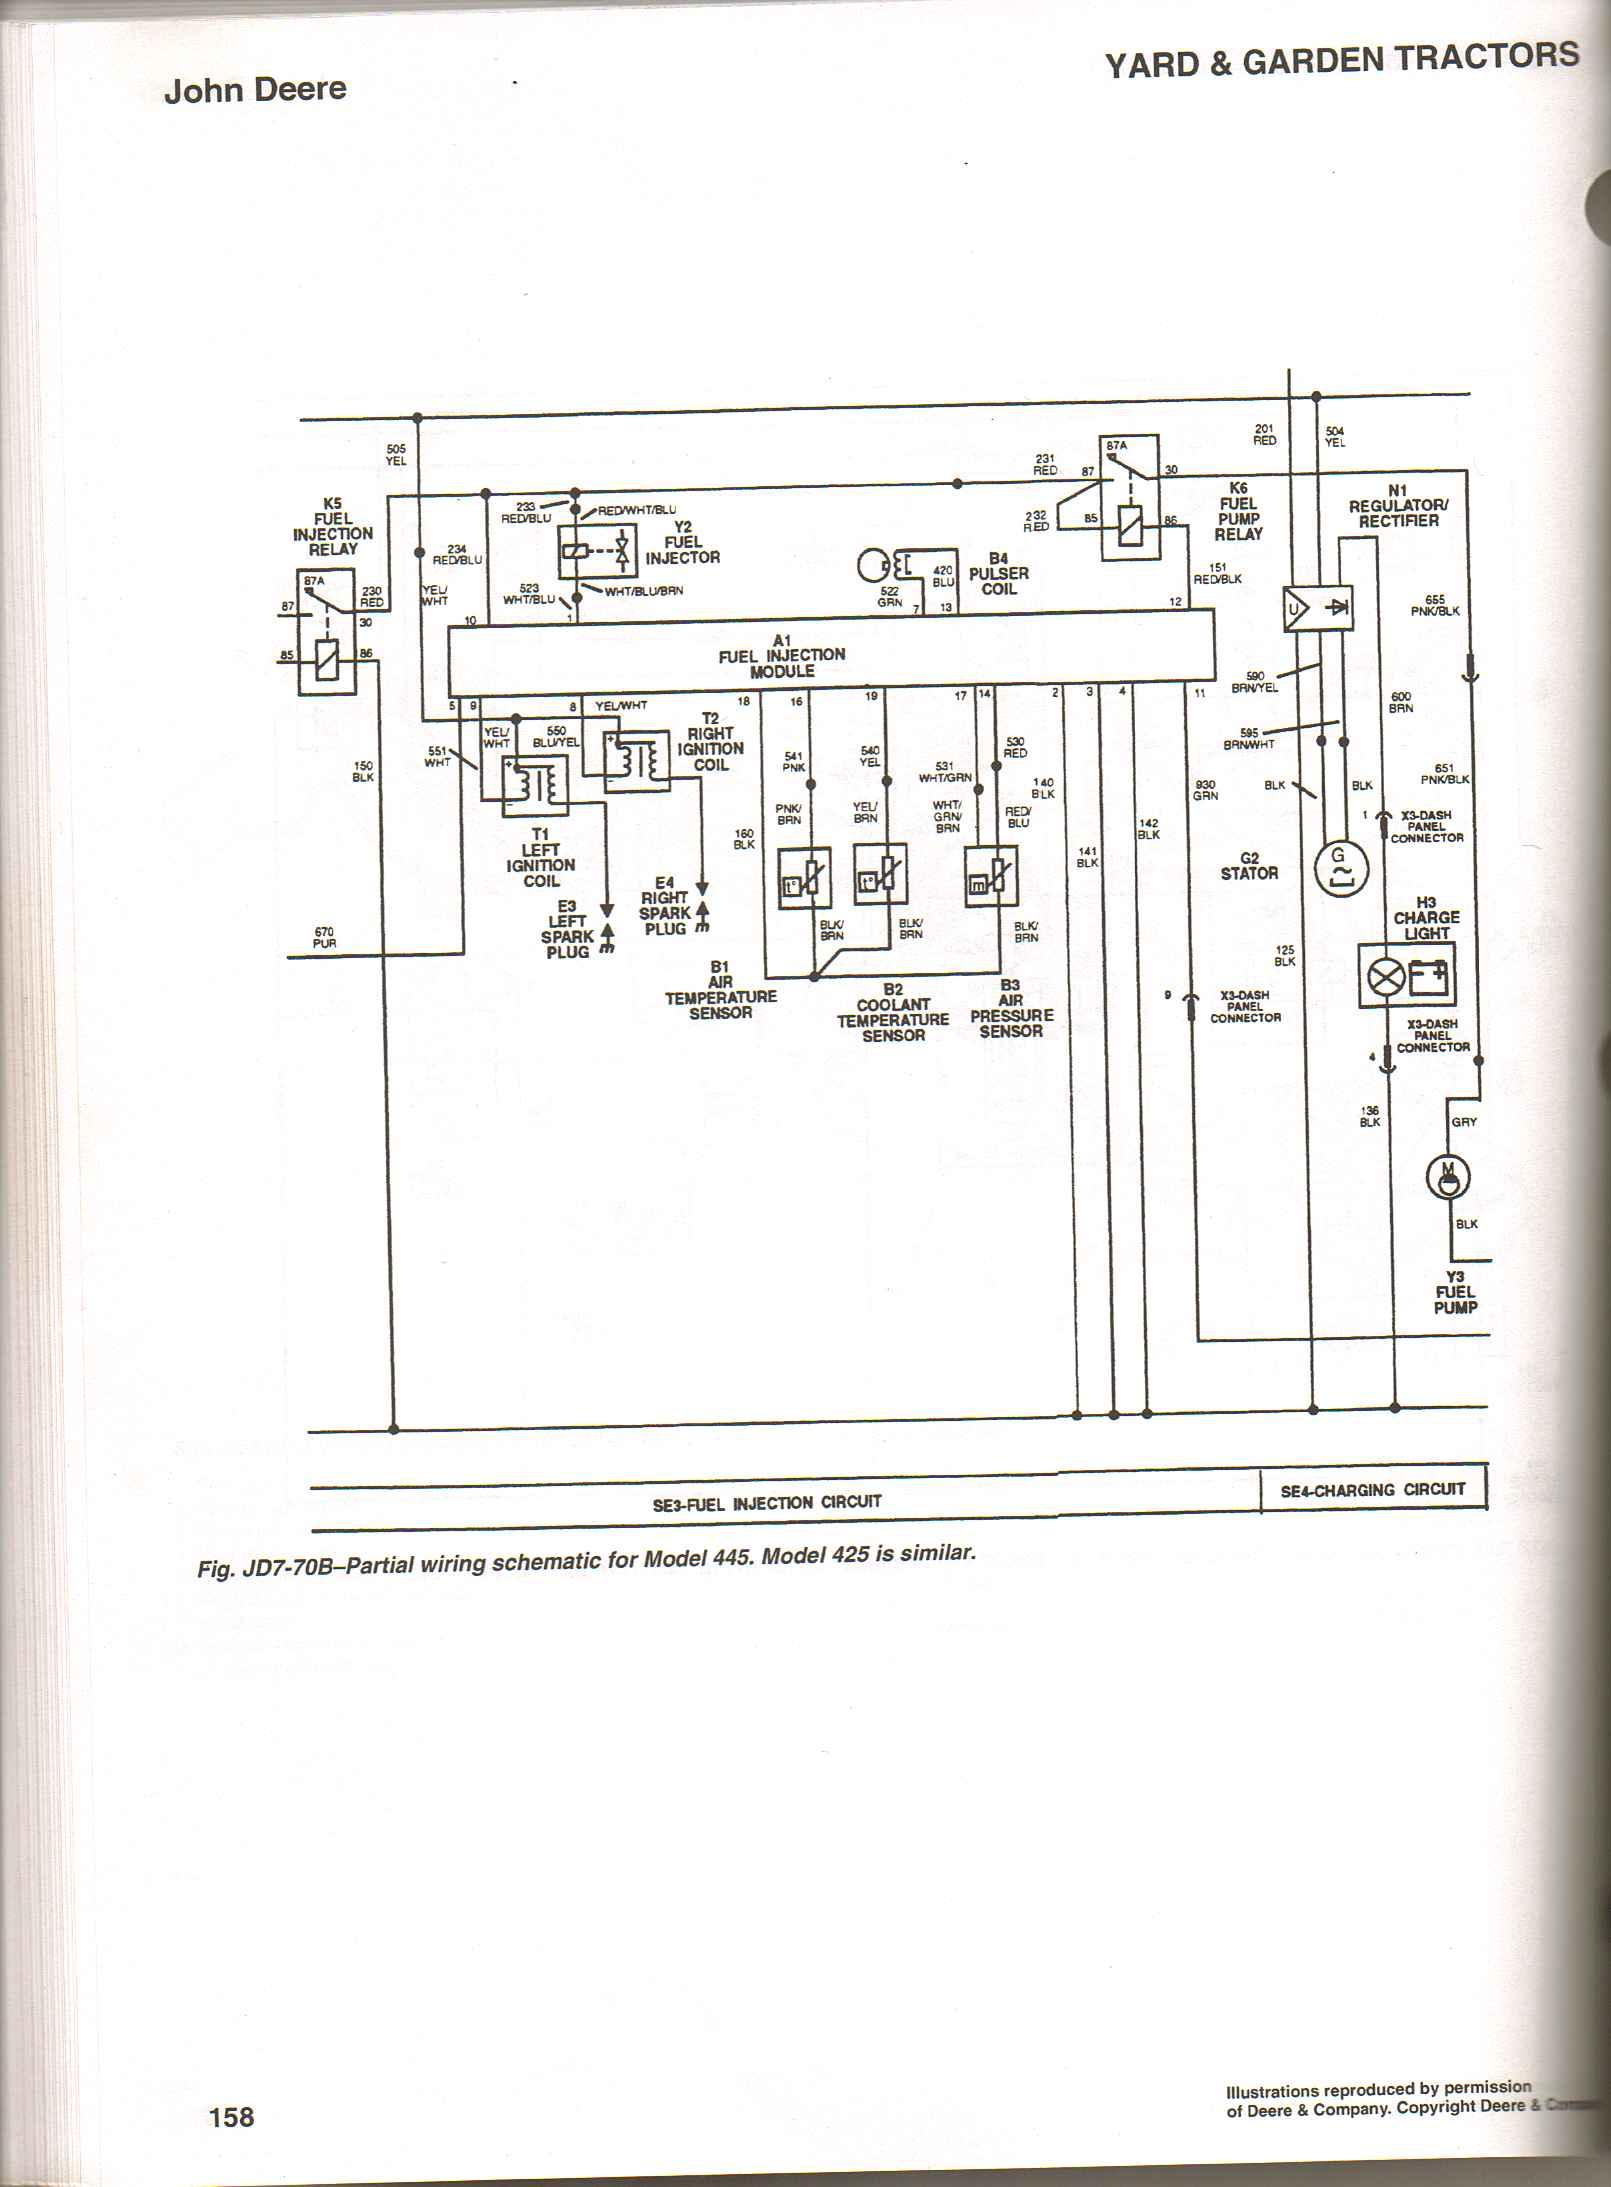 a1672012-6152-47e8-af2f-f03c983bf79f_Deere 425 4453.jpg